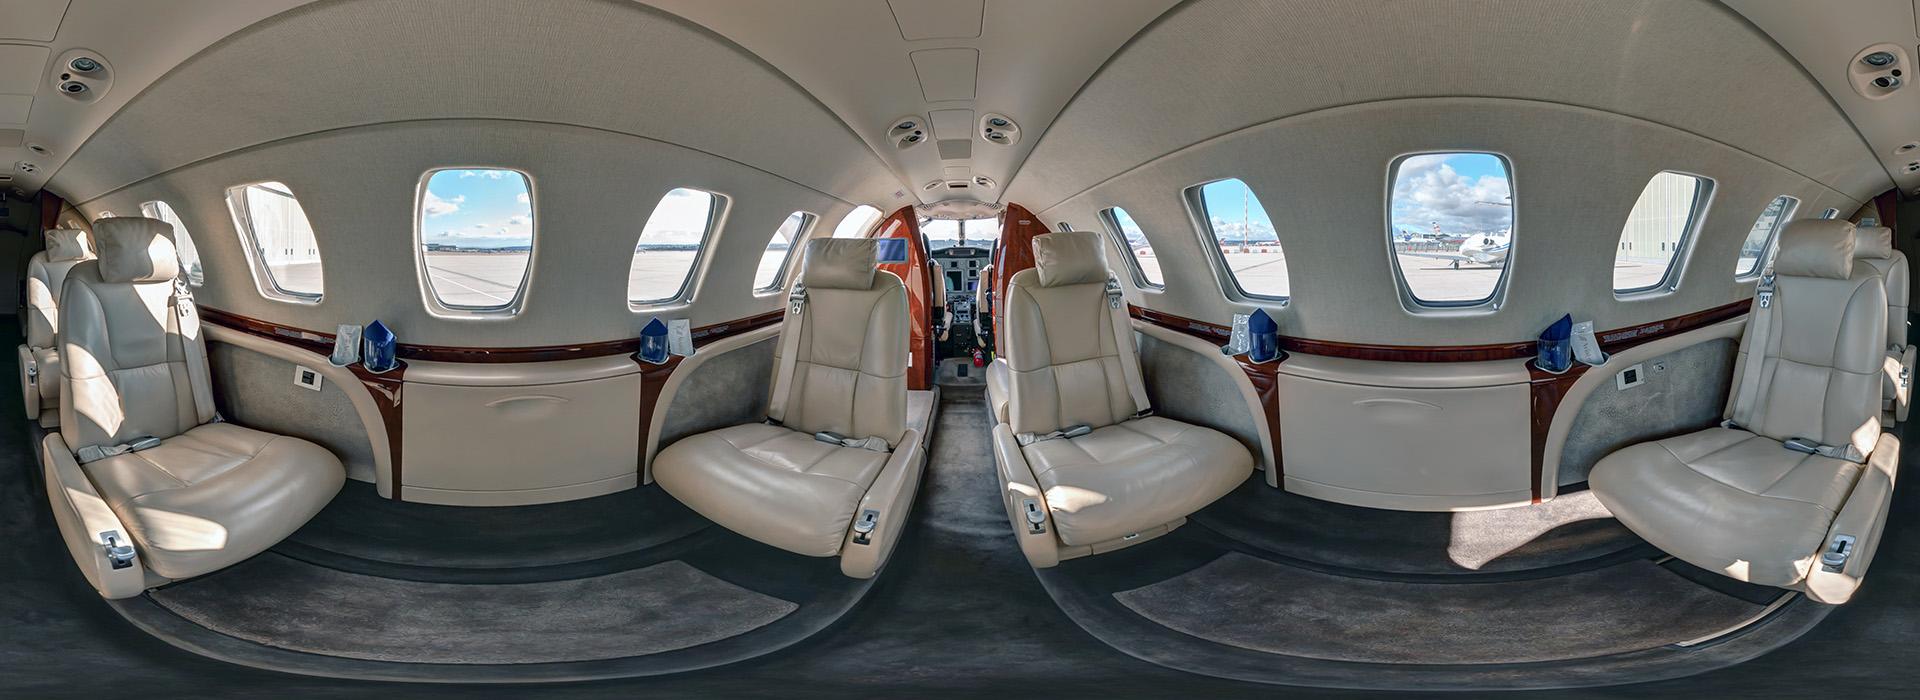 e_aviation_927_slide